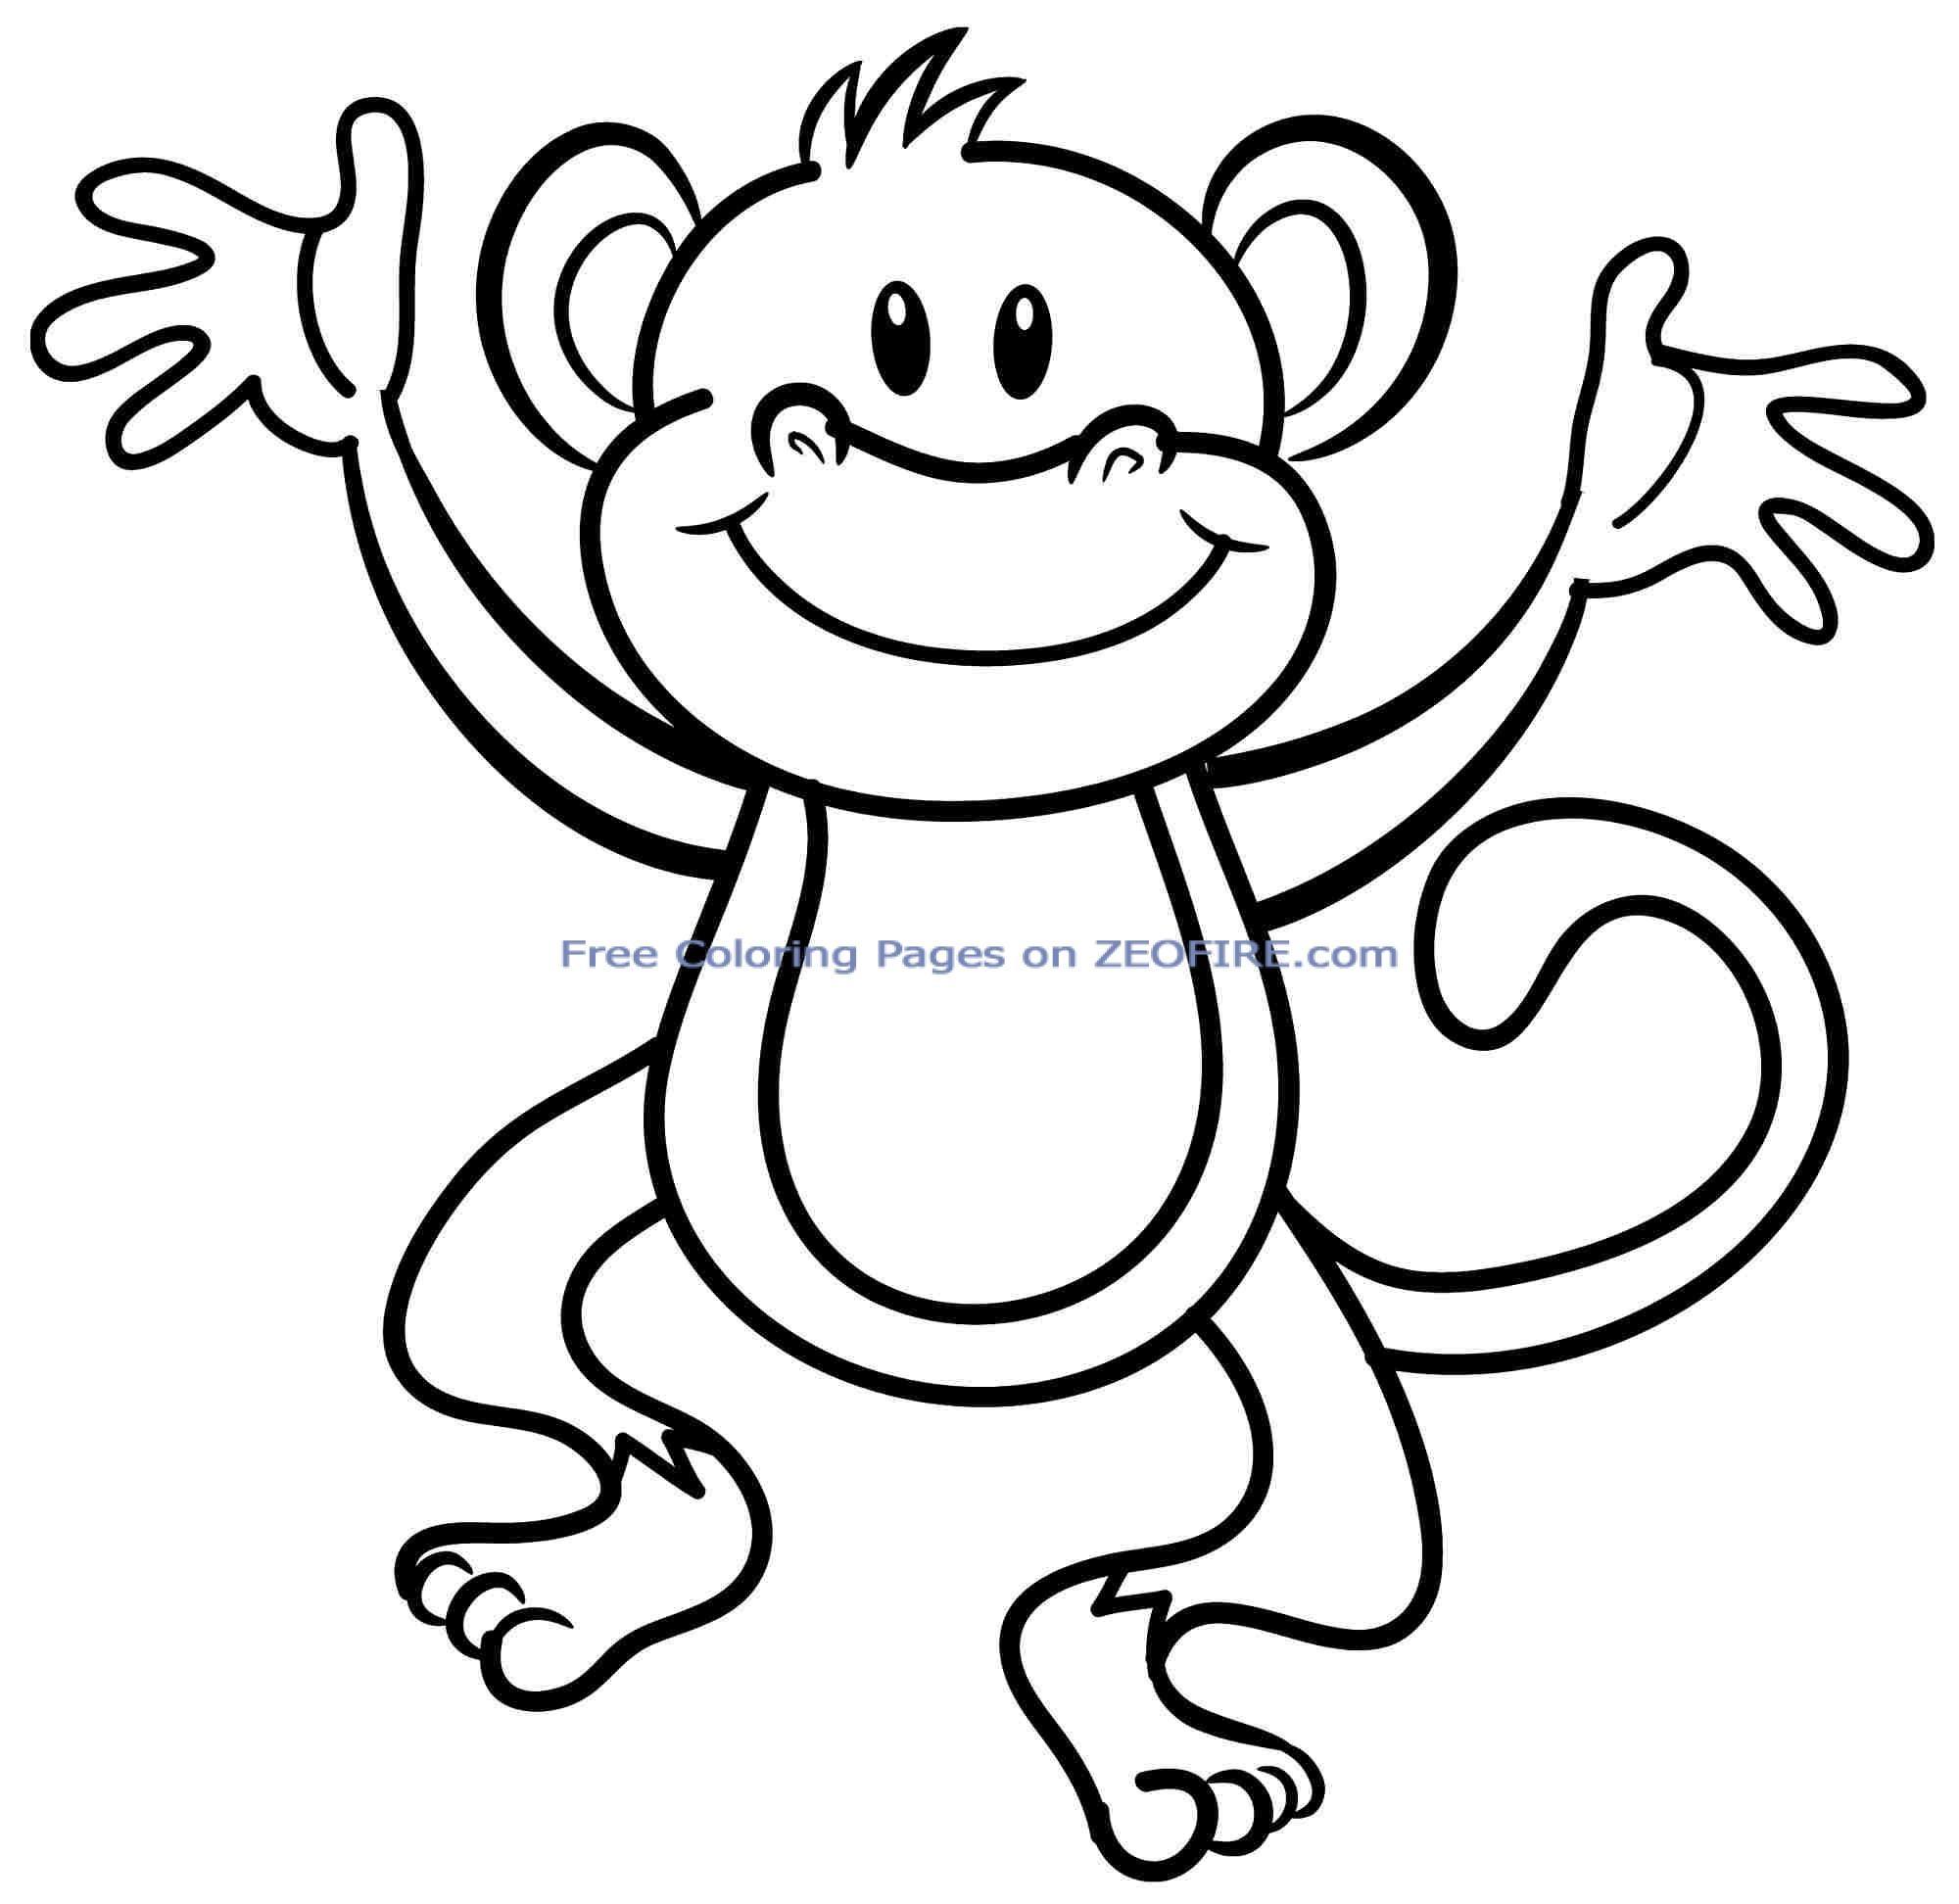 For Preschool #27100 Check More At Httpwwwmcoloringcomindexphp 20150908Animal Monkeys Colouring Sheets Printable Free For Preschool 27100